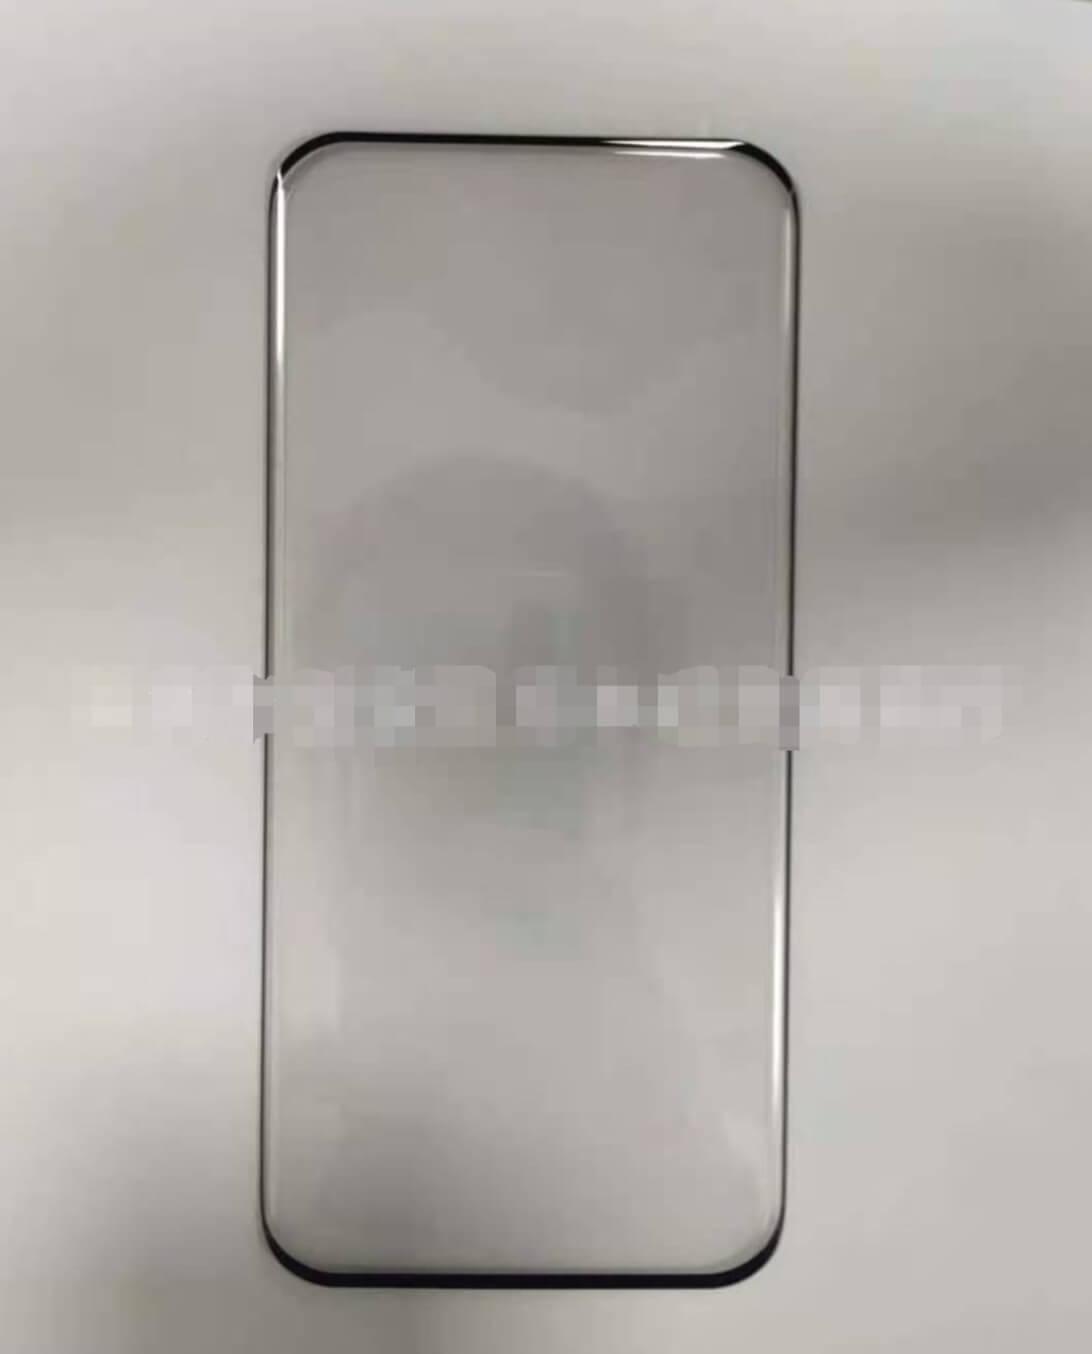 Xiaomi Mi 11, первый смартфон на Snapdragon 888, появился на фото